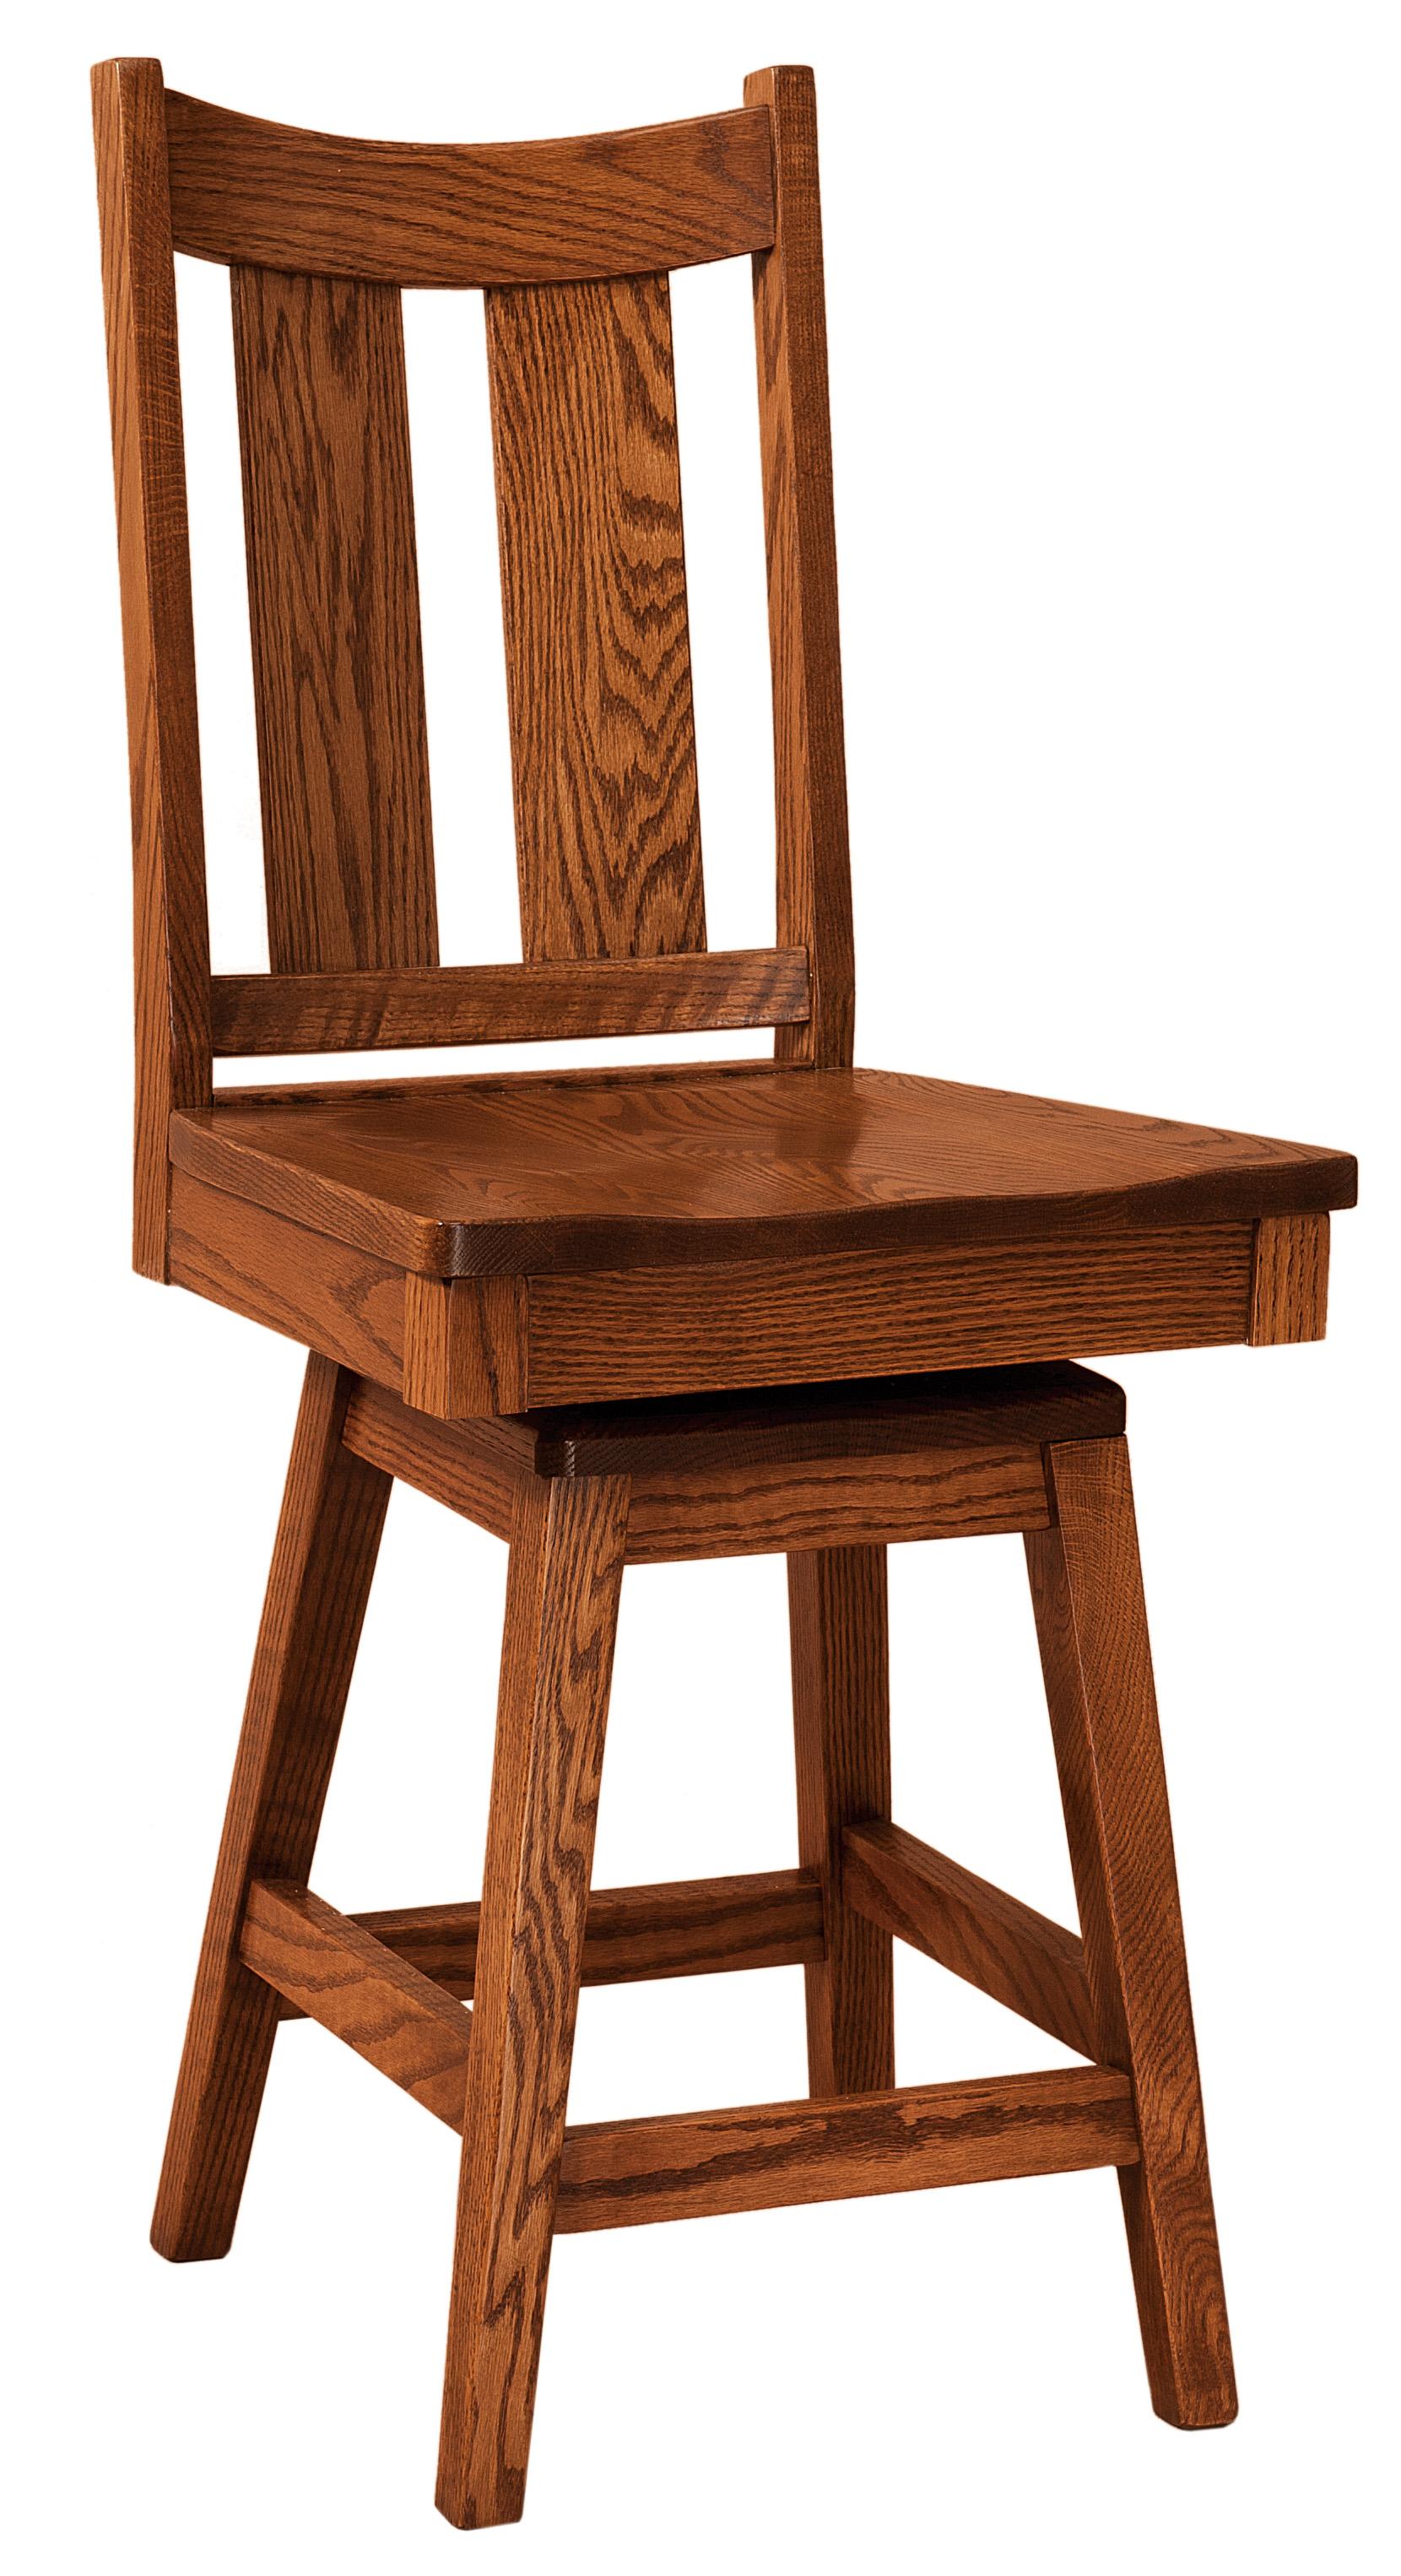 F&n Woodworking Aspen Swivel Bar Stool Pertaining To Aspen Swivel Chairs (View 10 of 25)